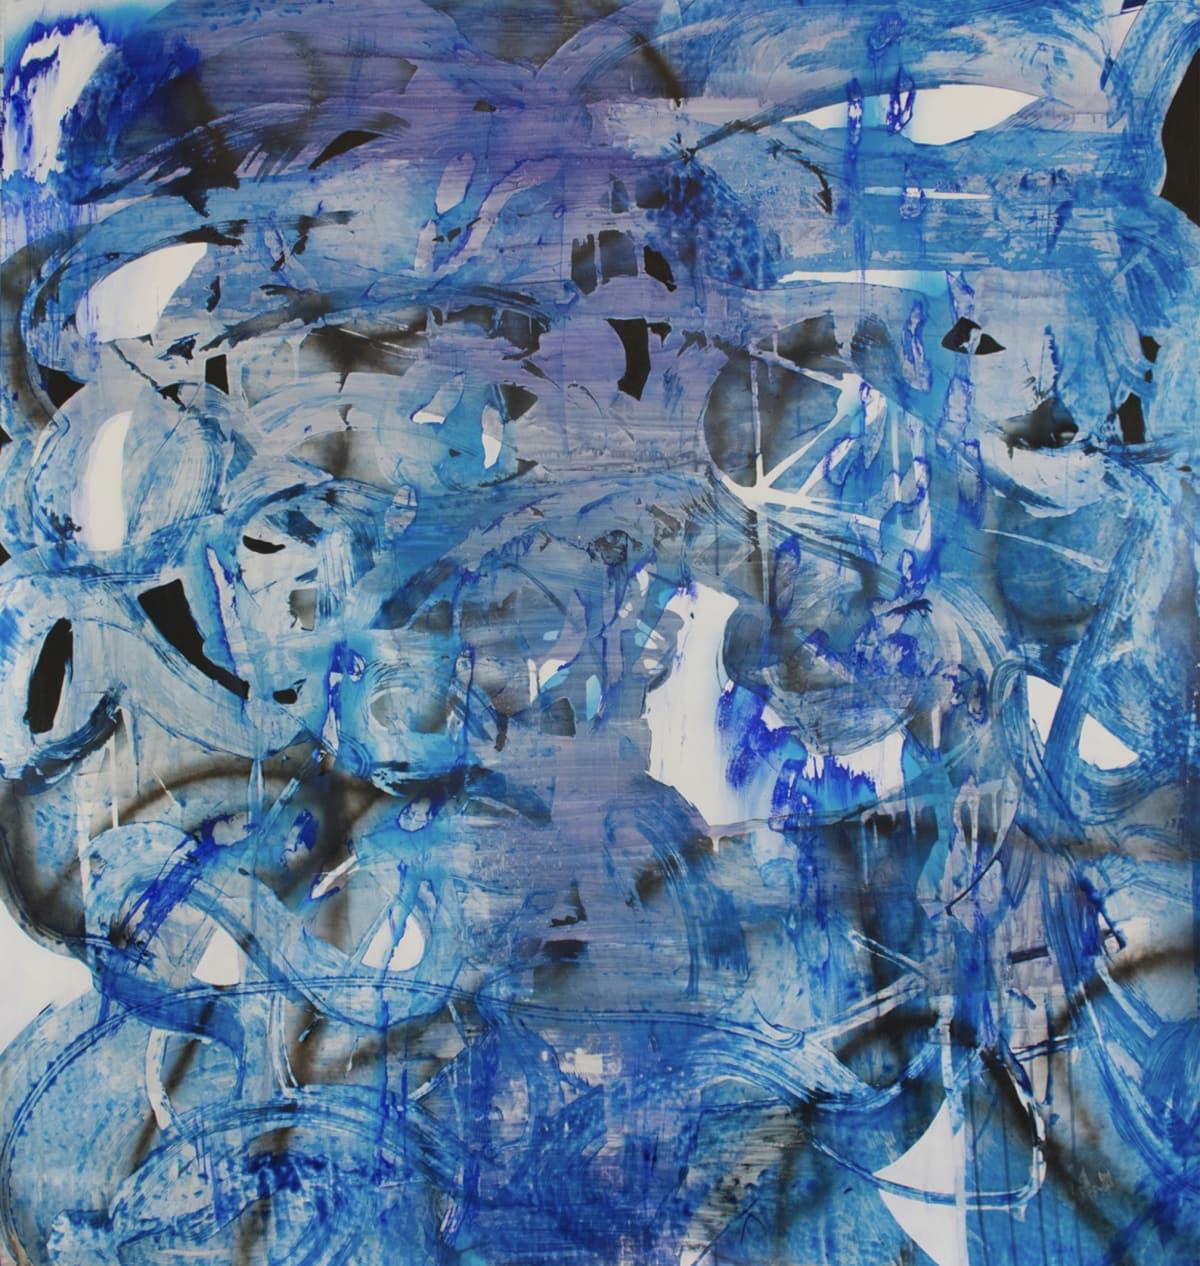 Chris Trueman SHPWRK, 2018 Acrylic Paint & Acrylic Spray Paint on Yupo 66 x 60 in 167.6 x 152.4 cm